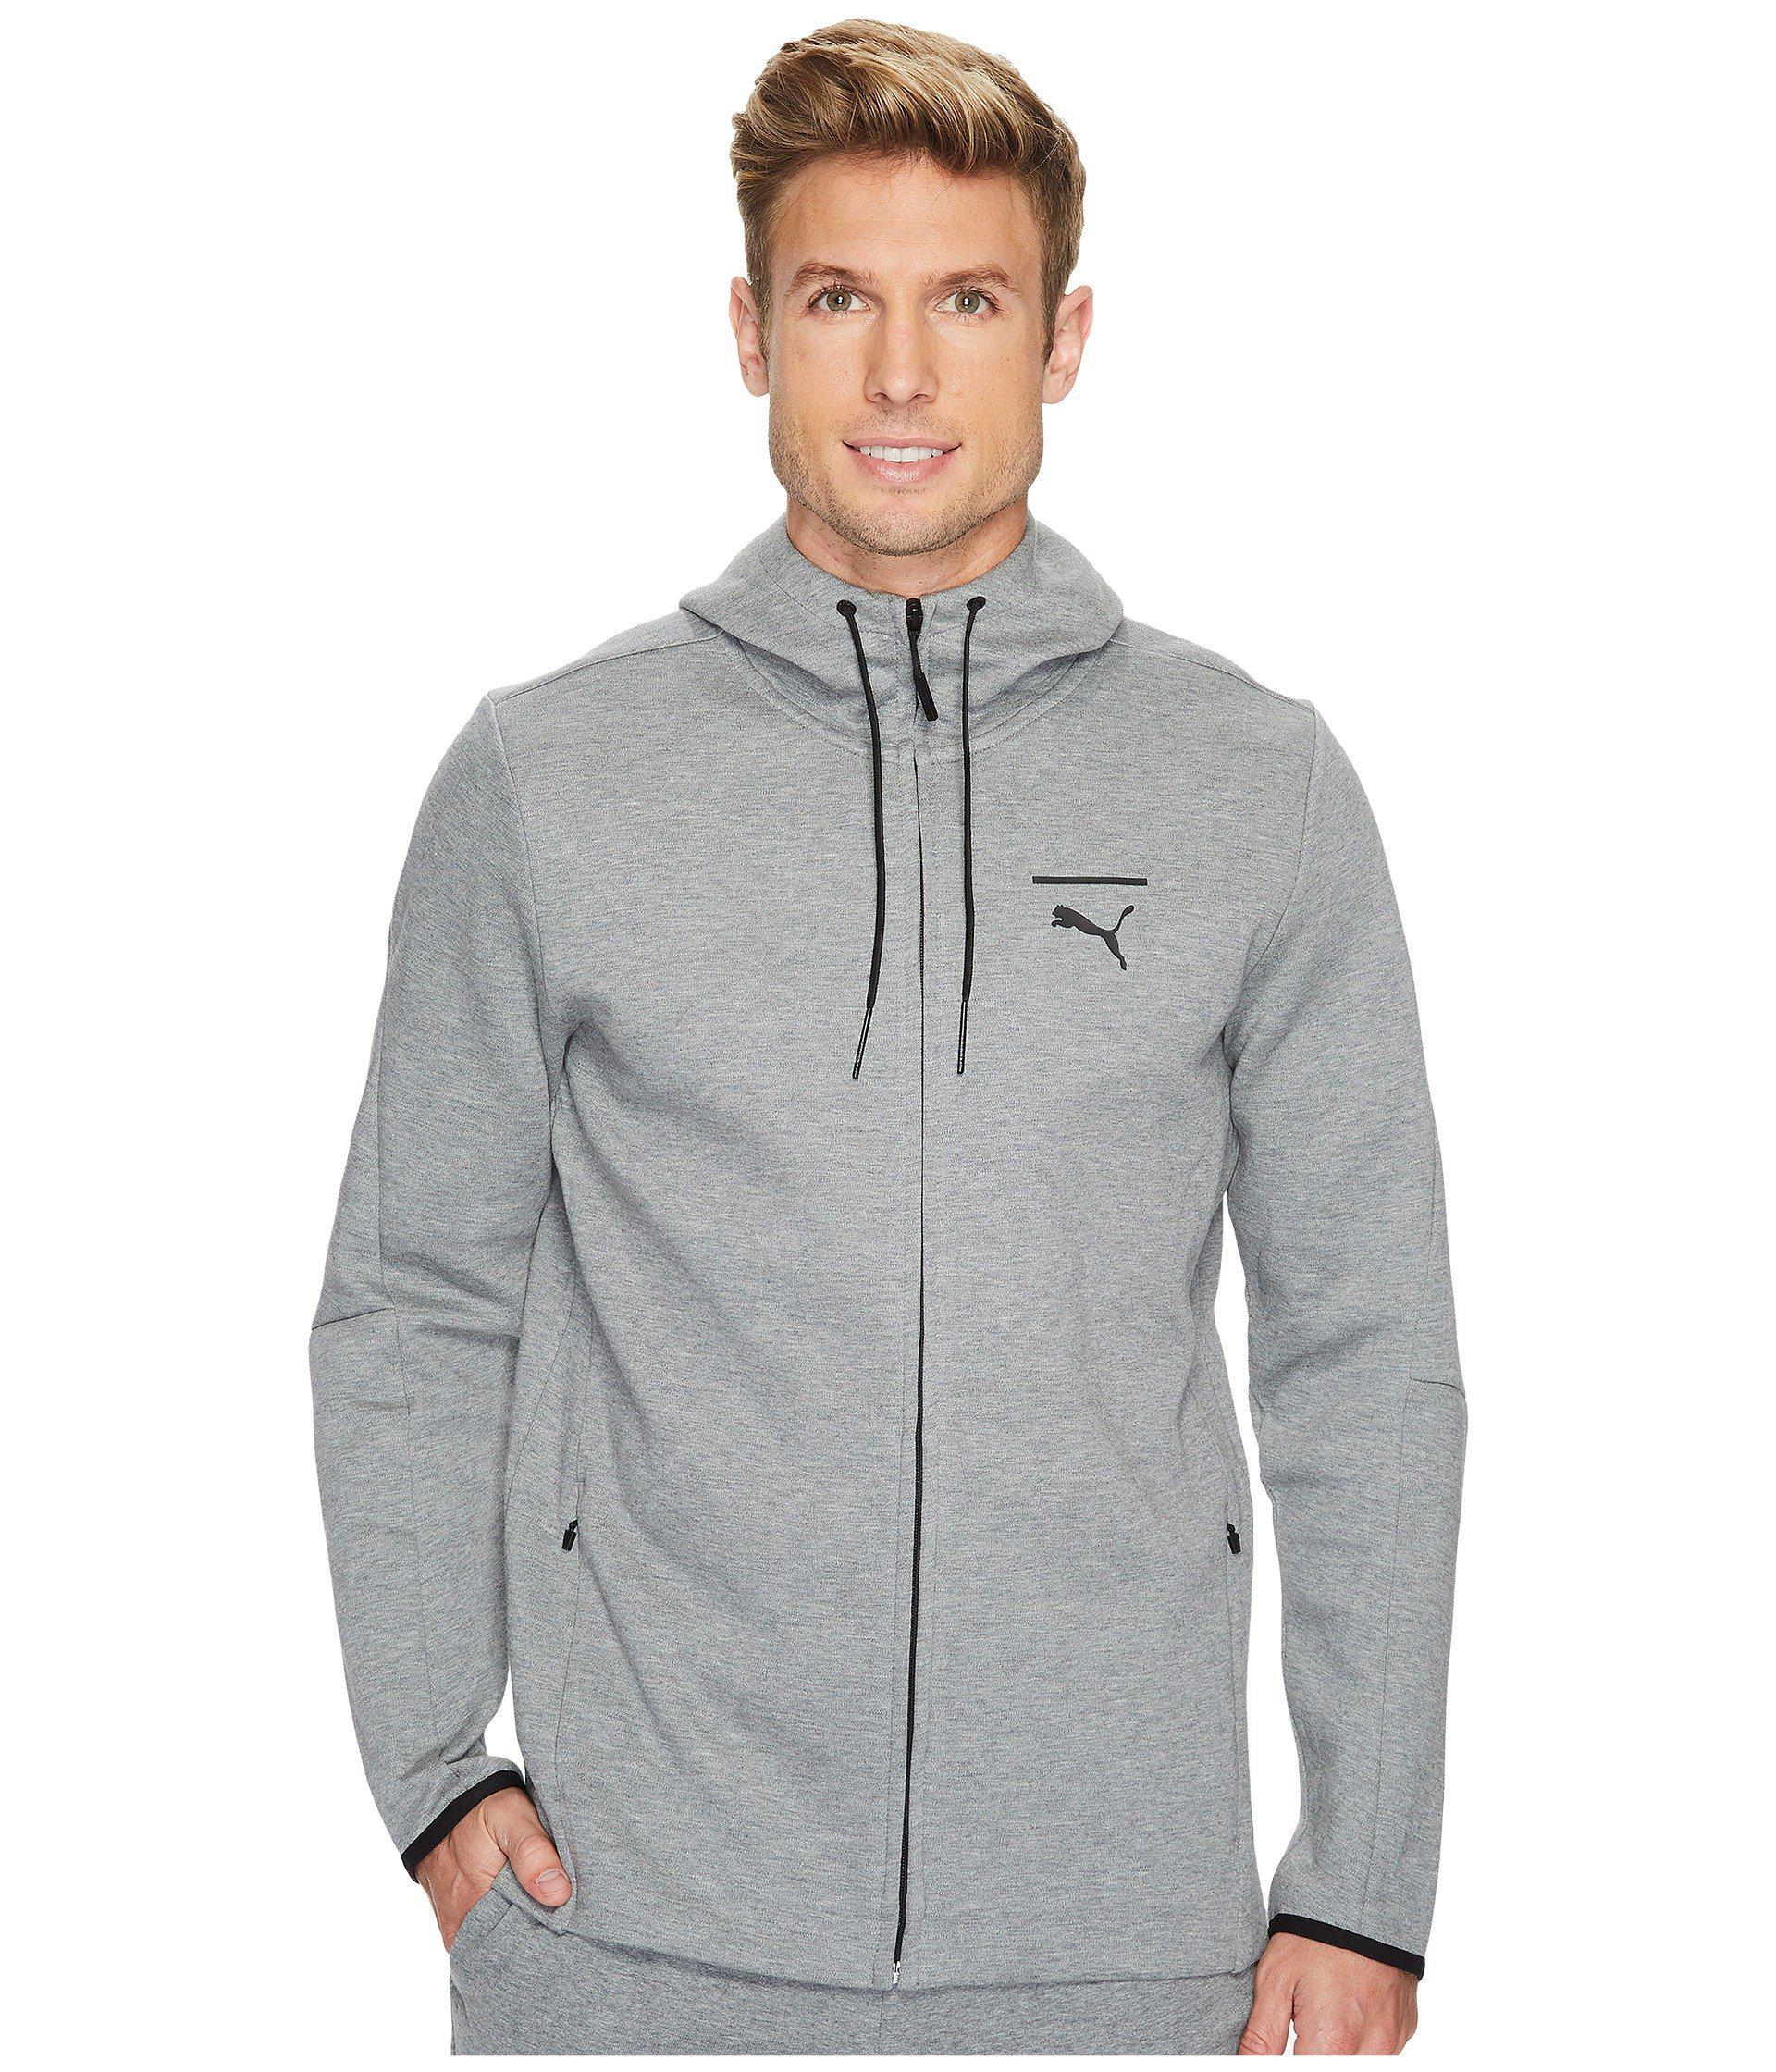 0f215f3952 Lyst - PUMA Evo Core Full Zip Hoodie in Gray for Men